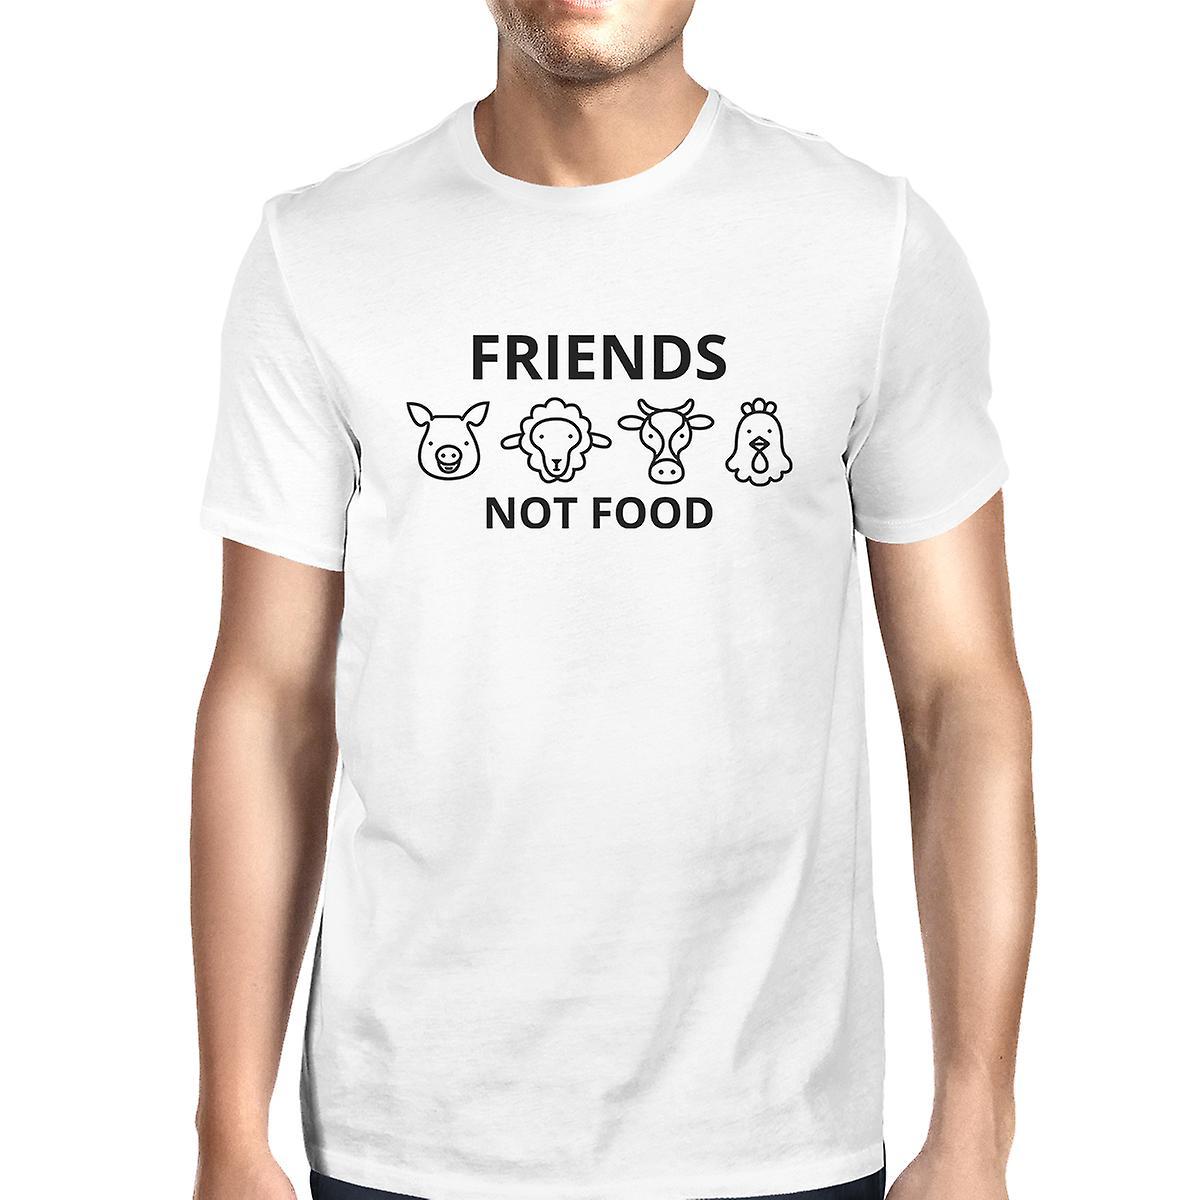 d172e5b3651 Friends Not Food Men s White Trendy Design Graphic Tee For Guys